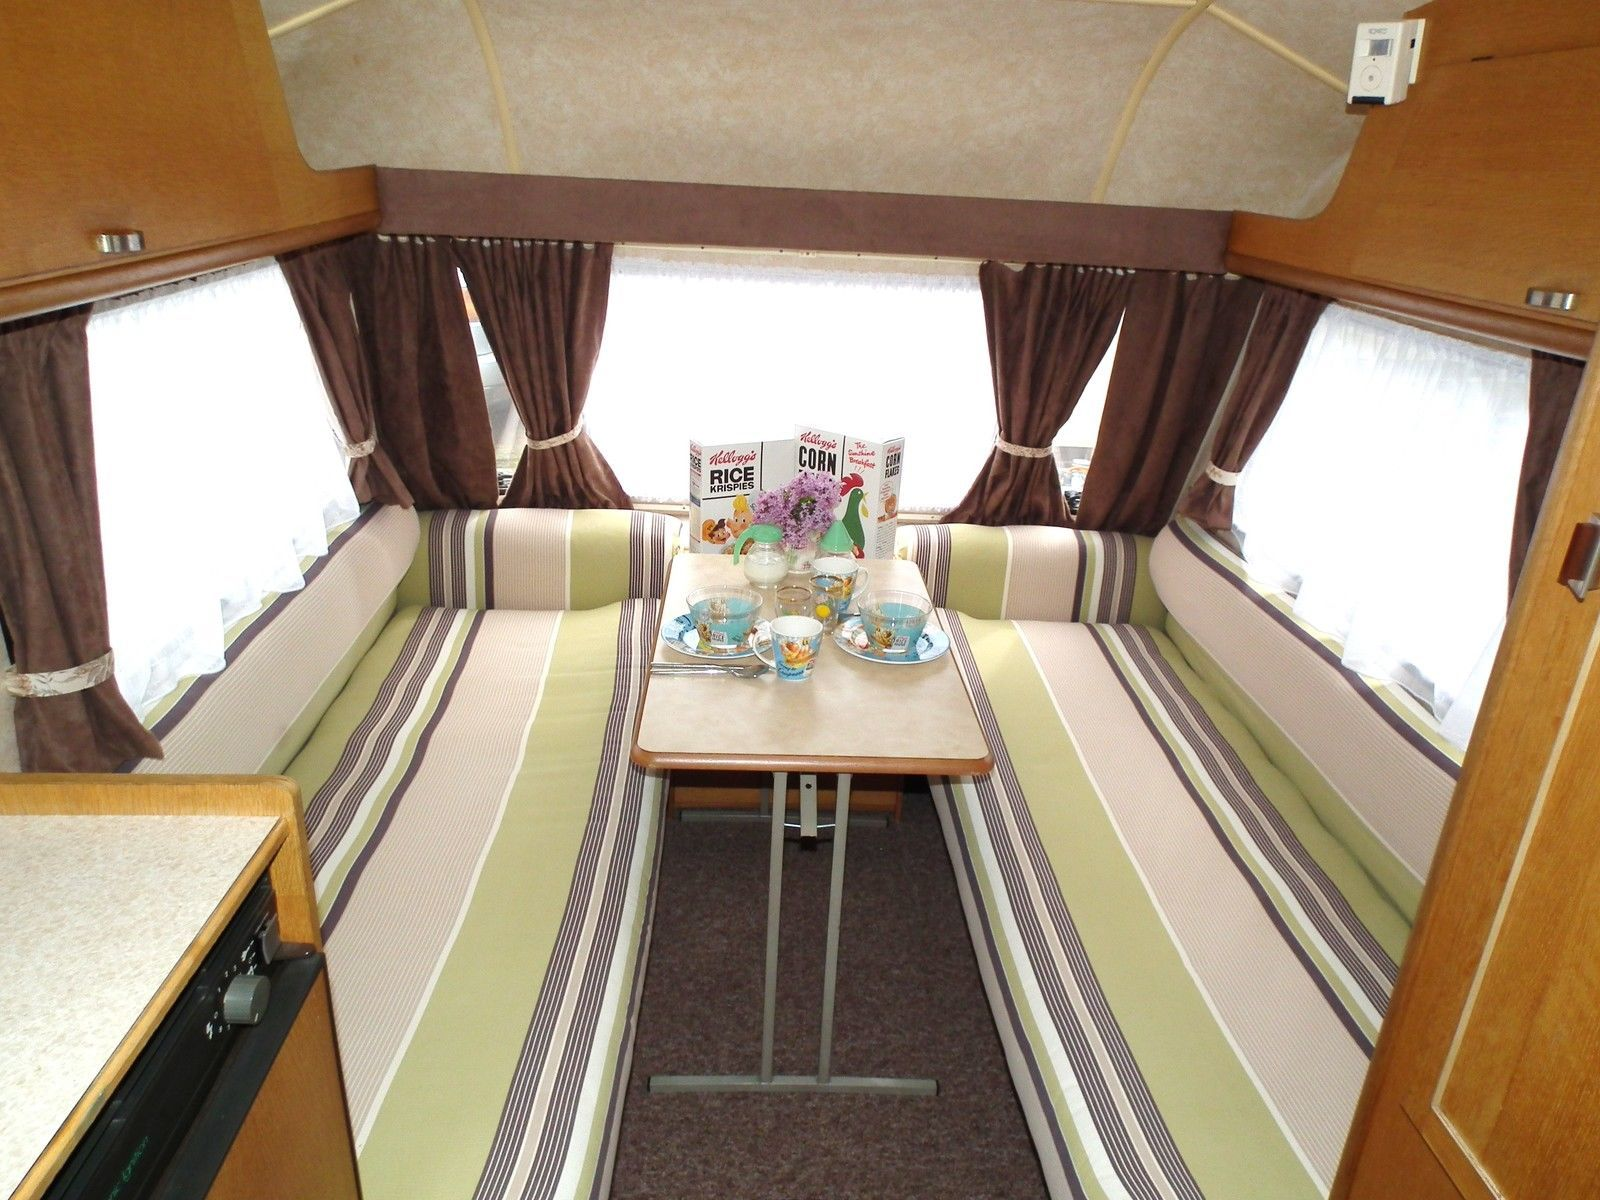 56 best caravan interior design ideas images on Pinterest | Caravan ...